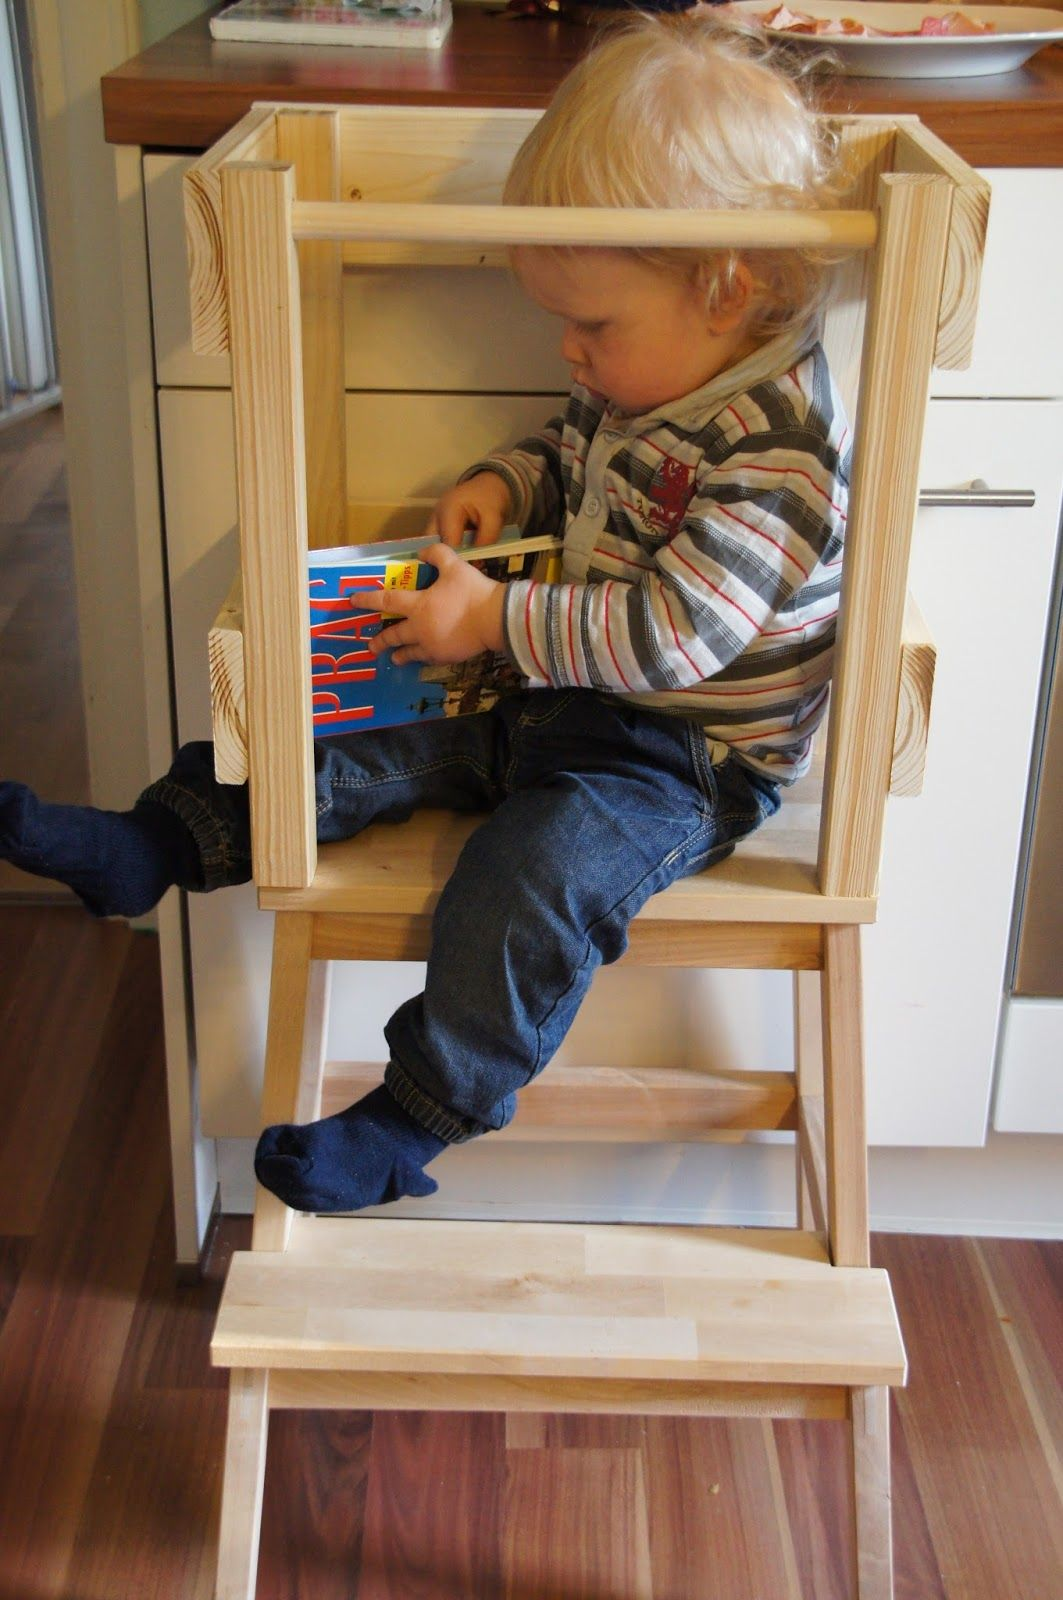 gl cksfl gel bauanleitung f r einen learning tower lernturm aus ikea hocker bekv m ikea. Black Bedroom Furniture Sets. Home Design Ideas